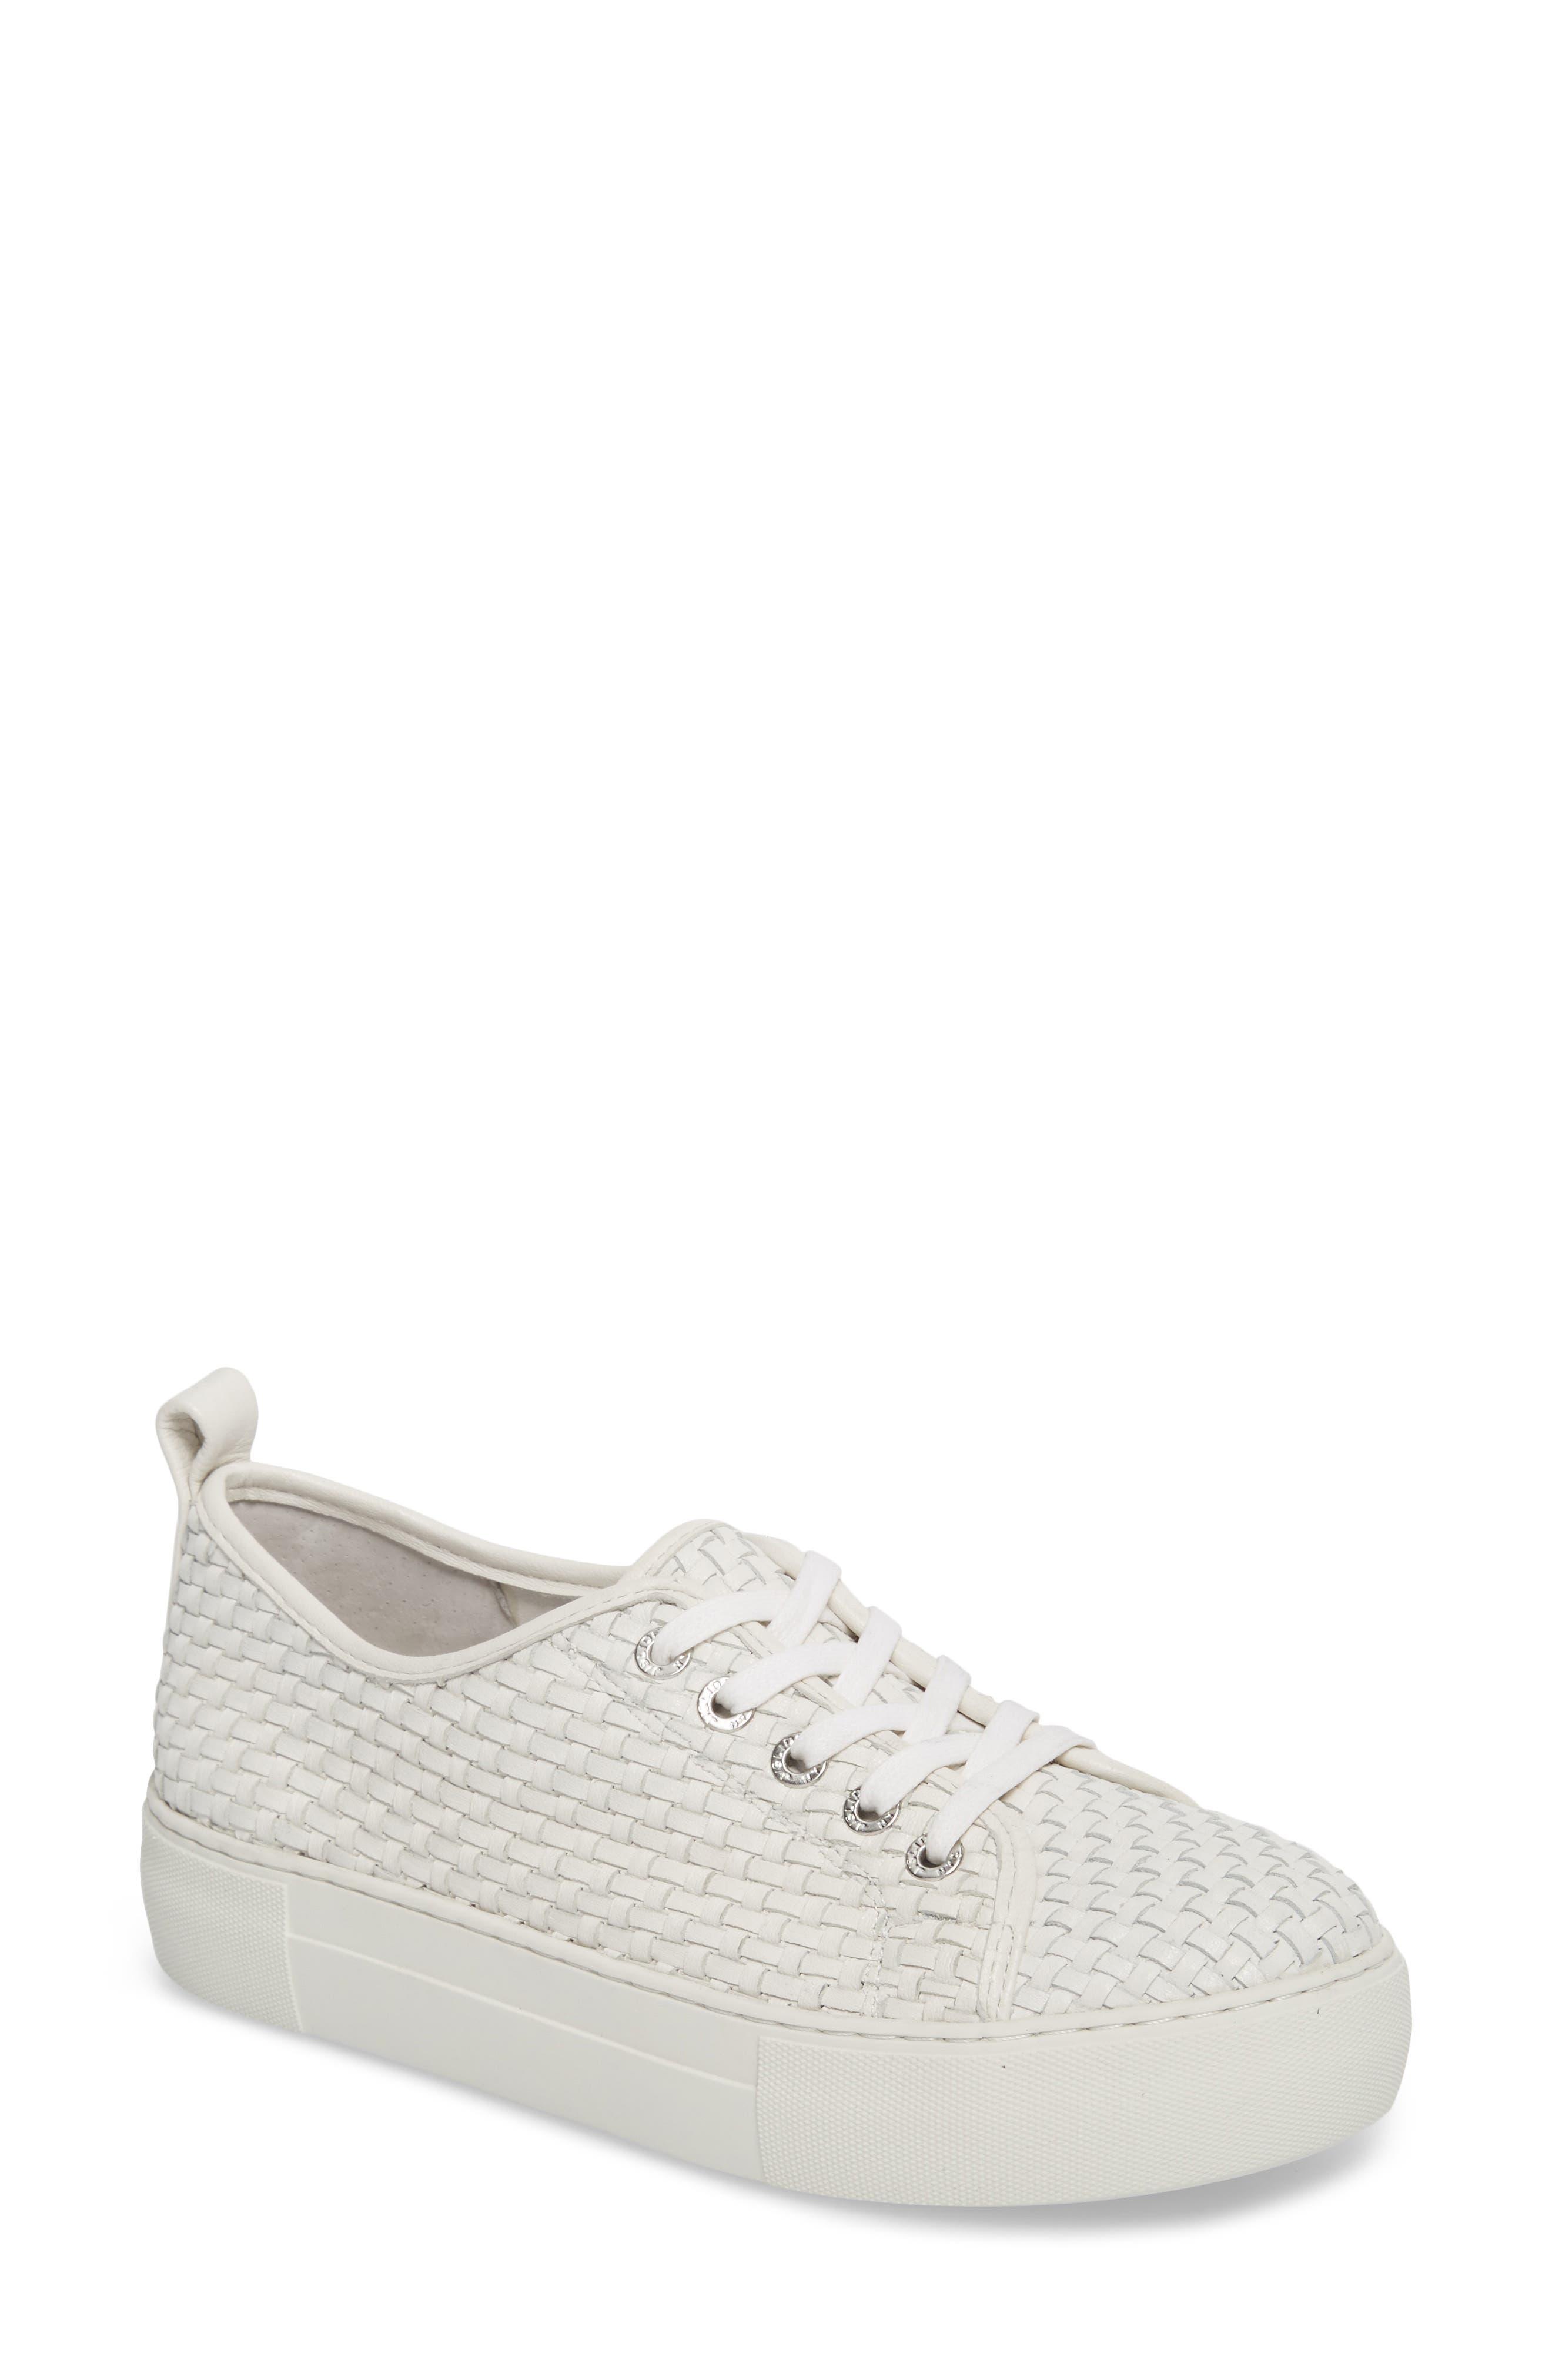 Artsy Woven Platform Sneaker,                             Main thumbnail 1, color,                             White Leather